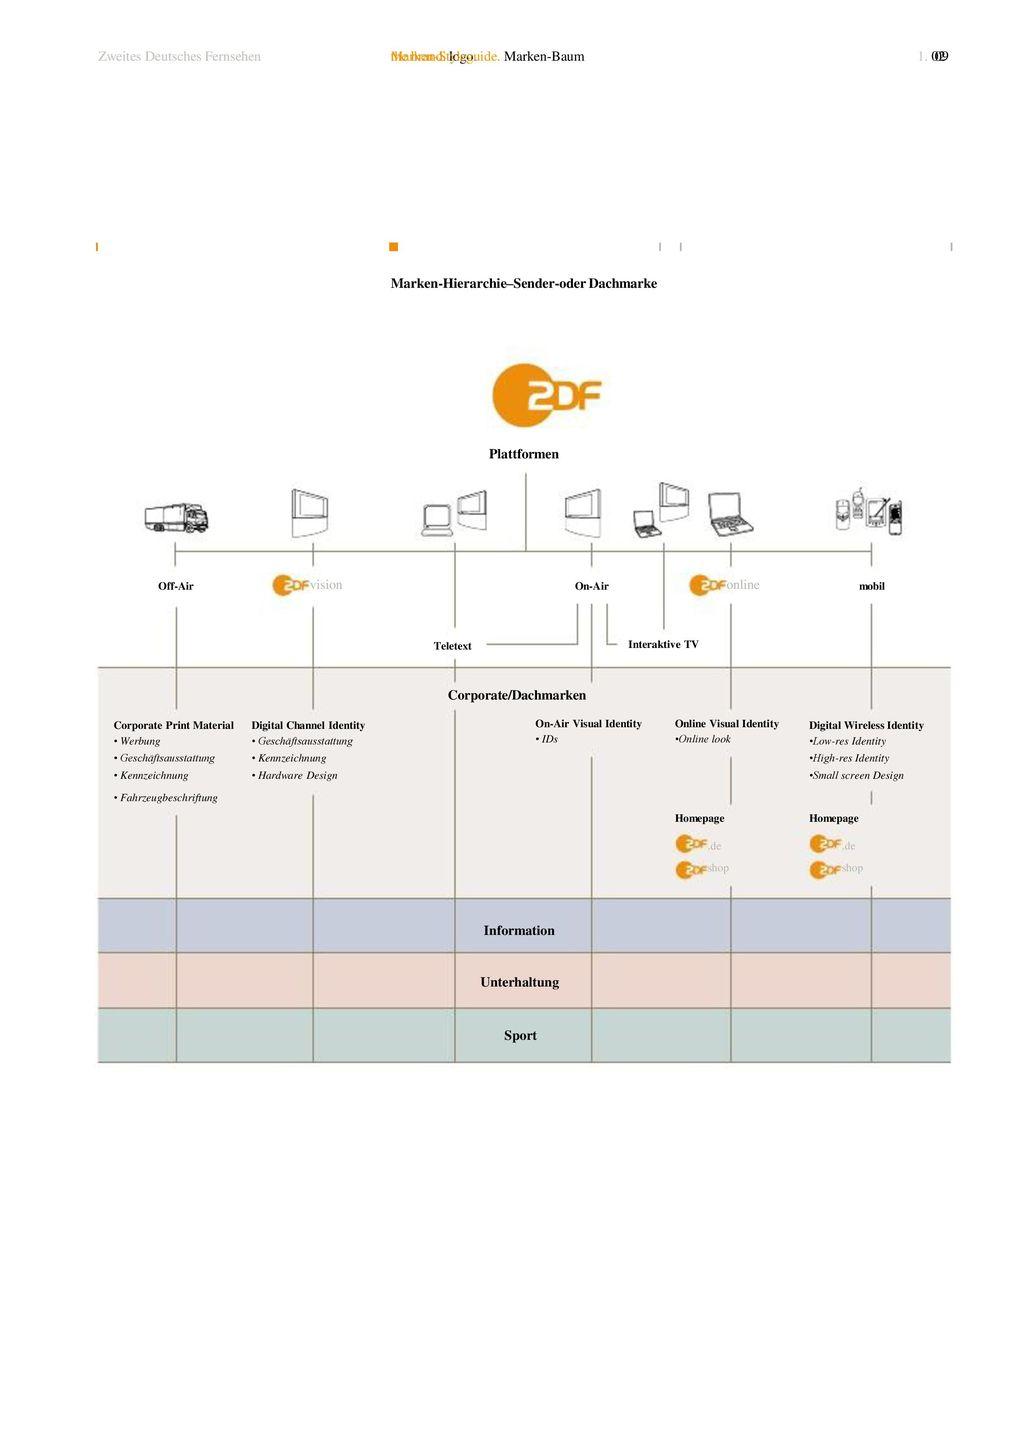 Corporate/Dachmarken